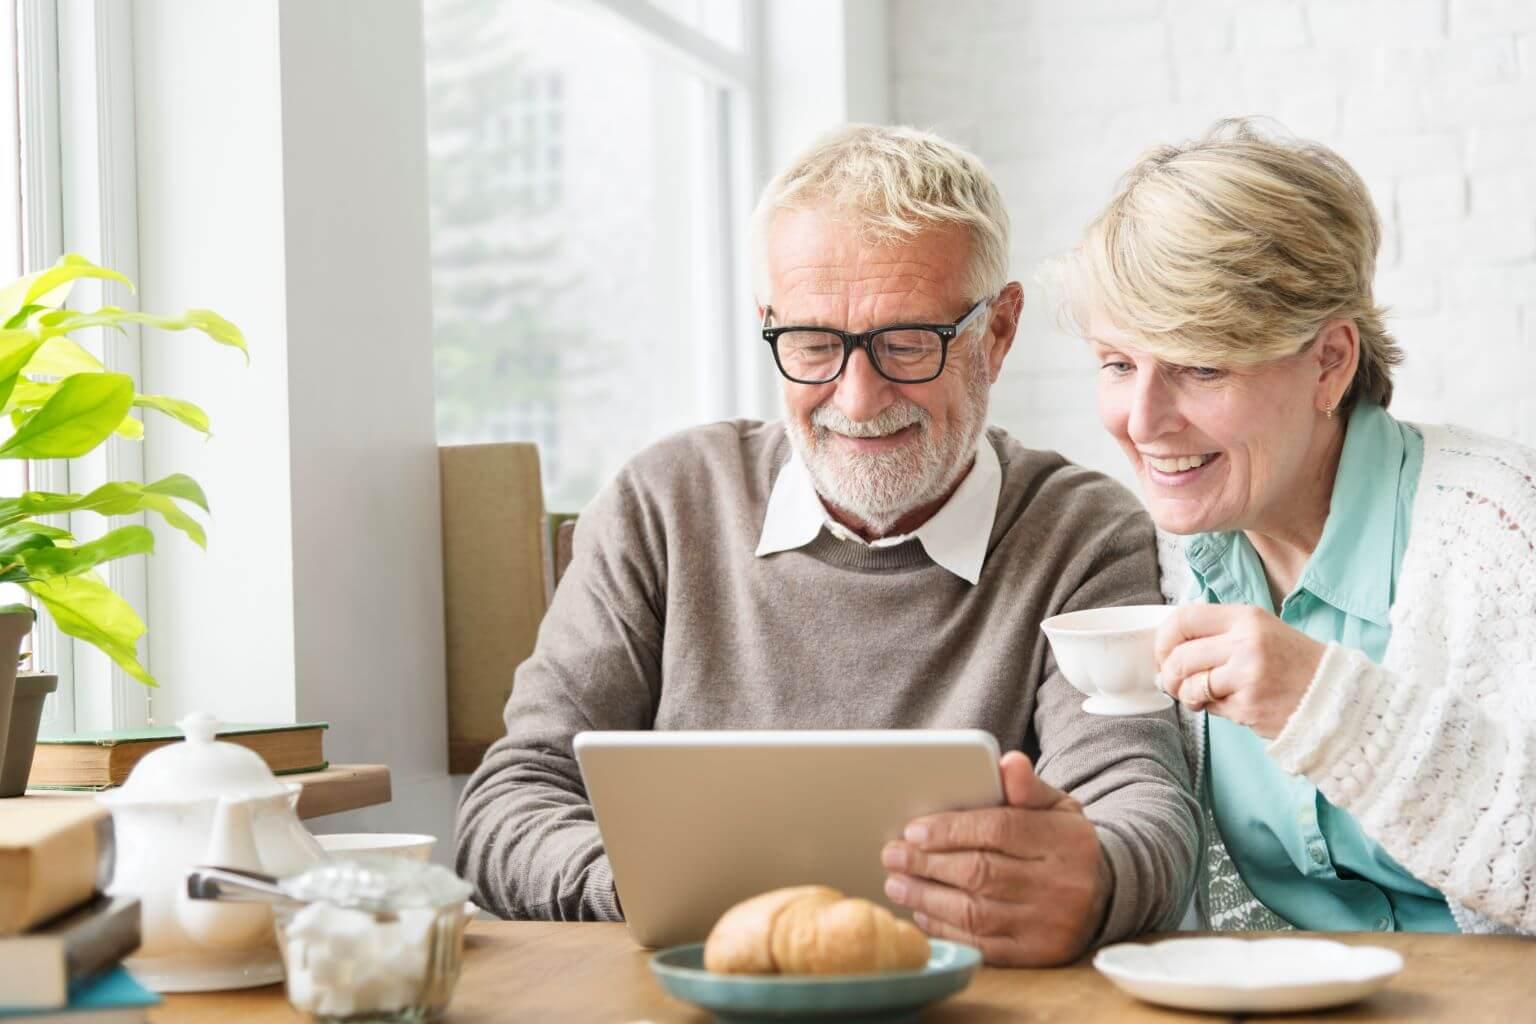 elderly-couple-looking-at-ipad